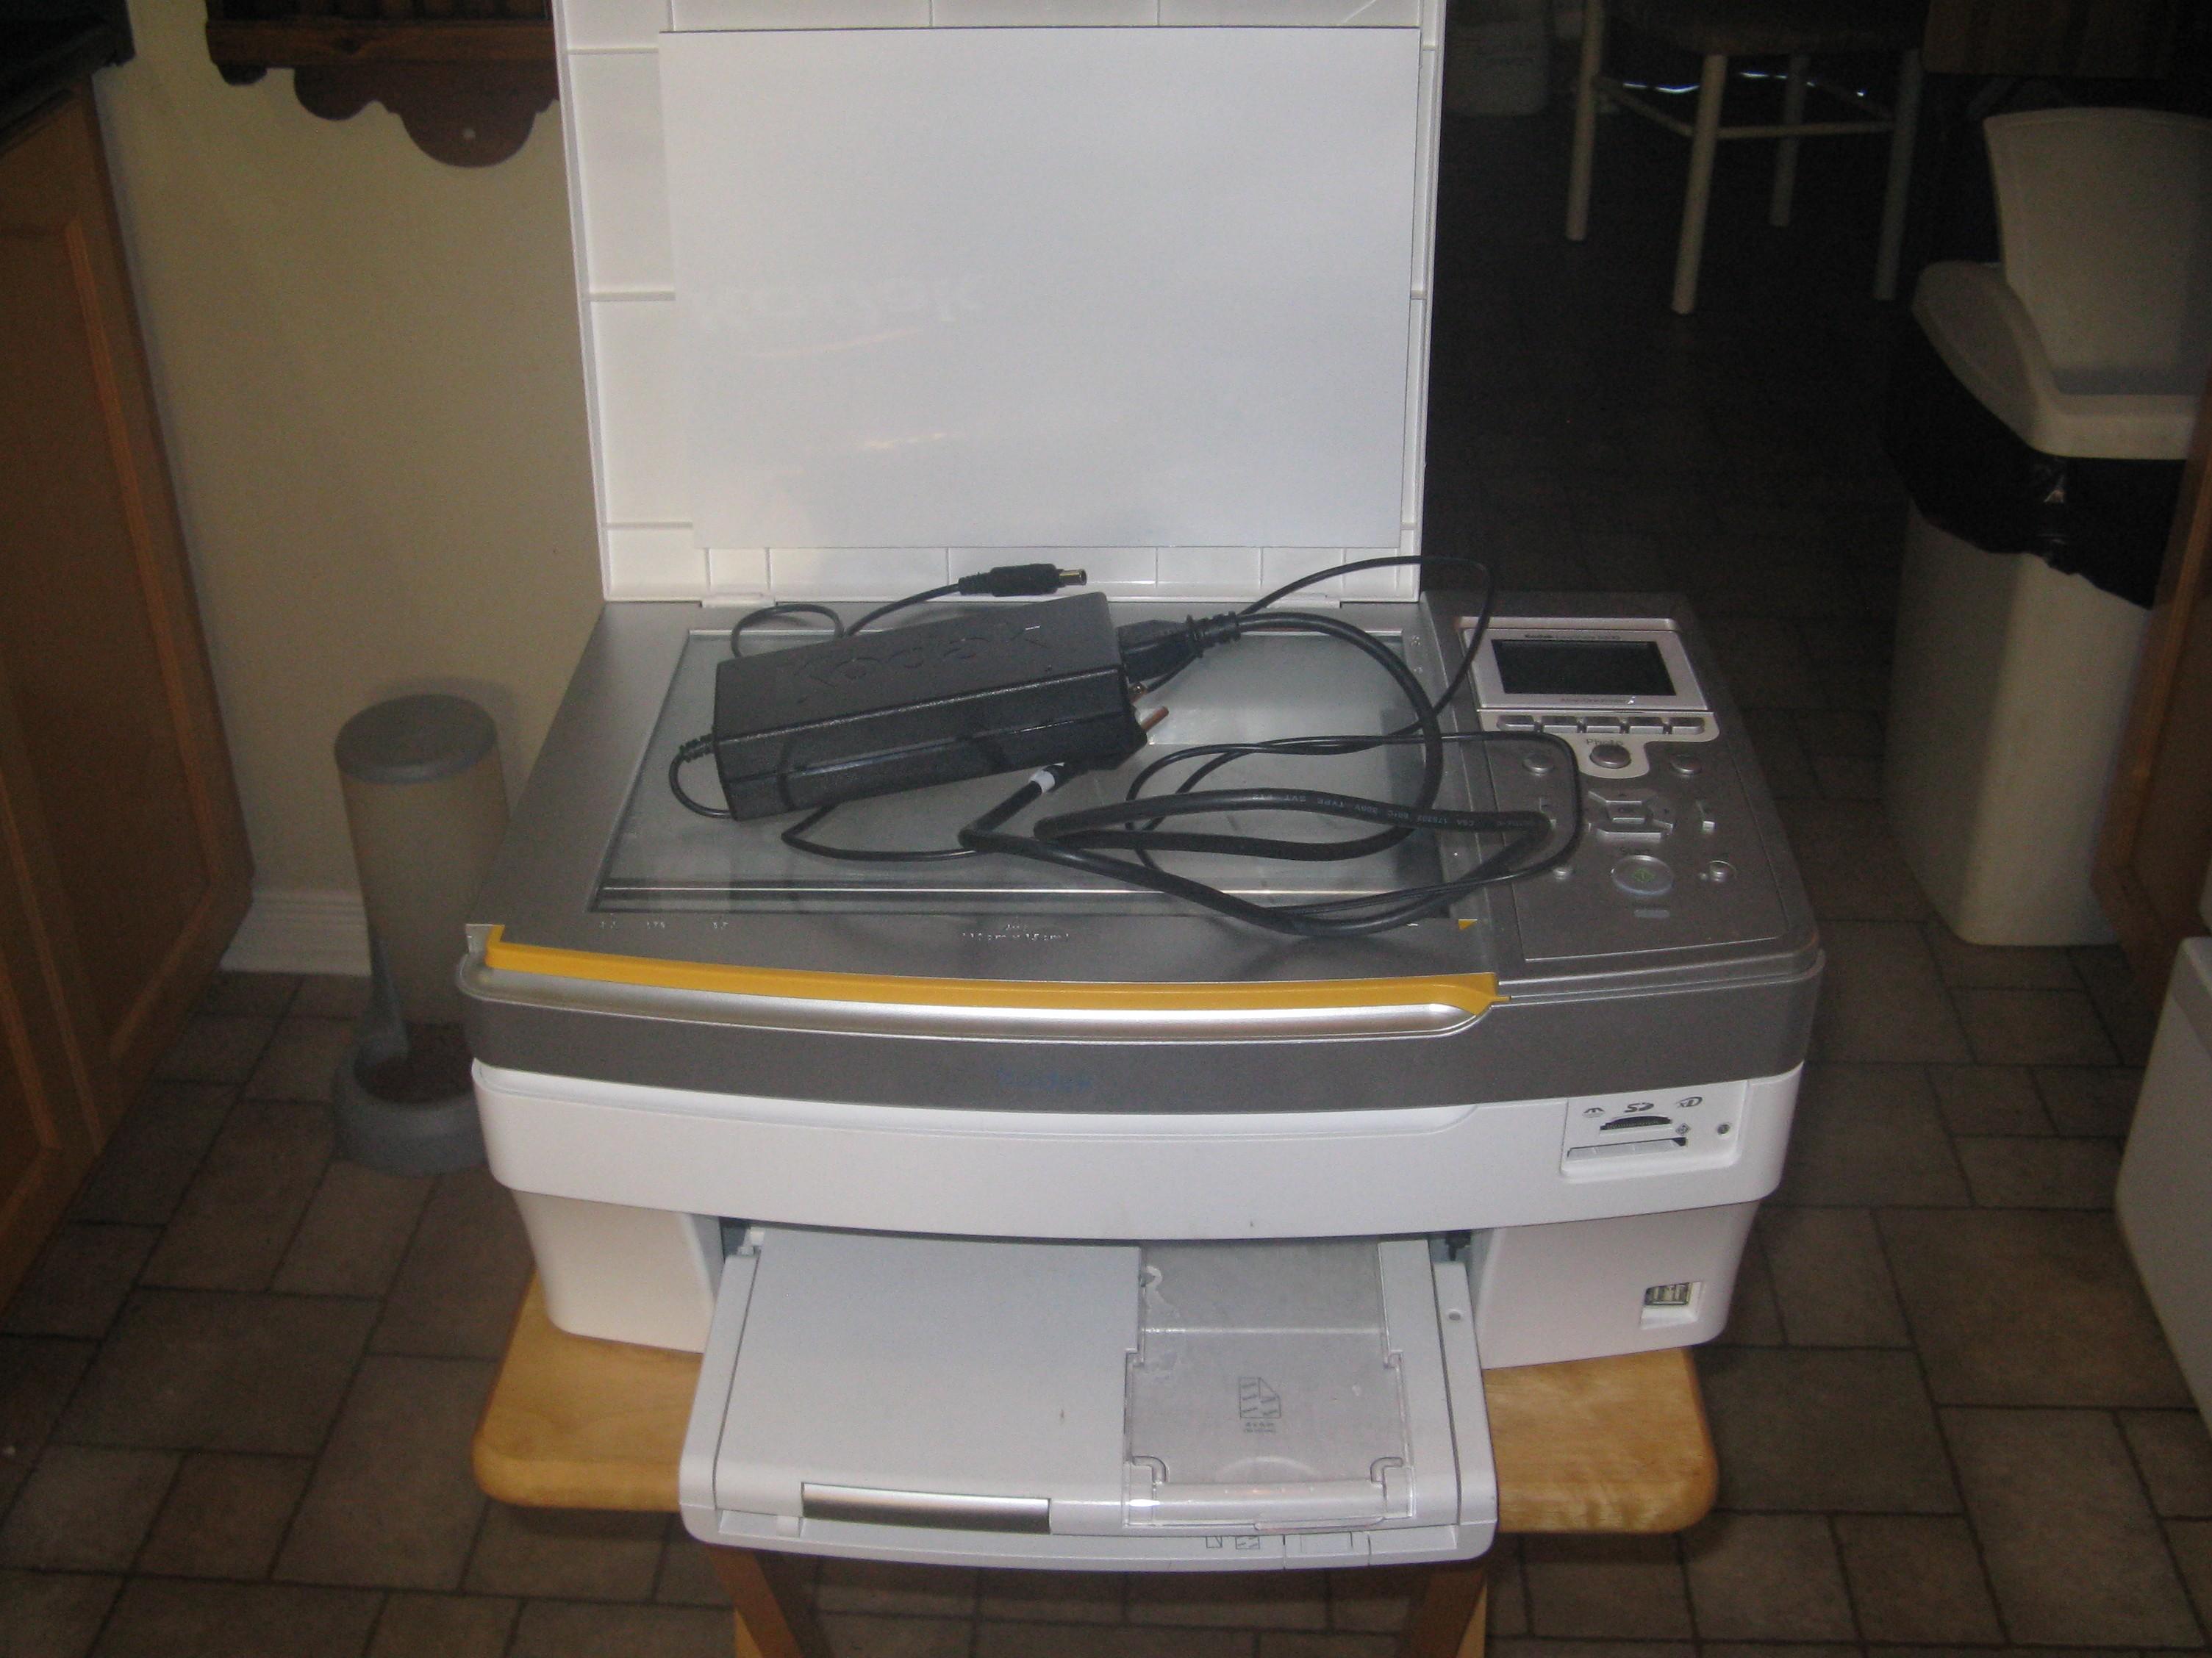 Picture of Kodak Scanner